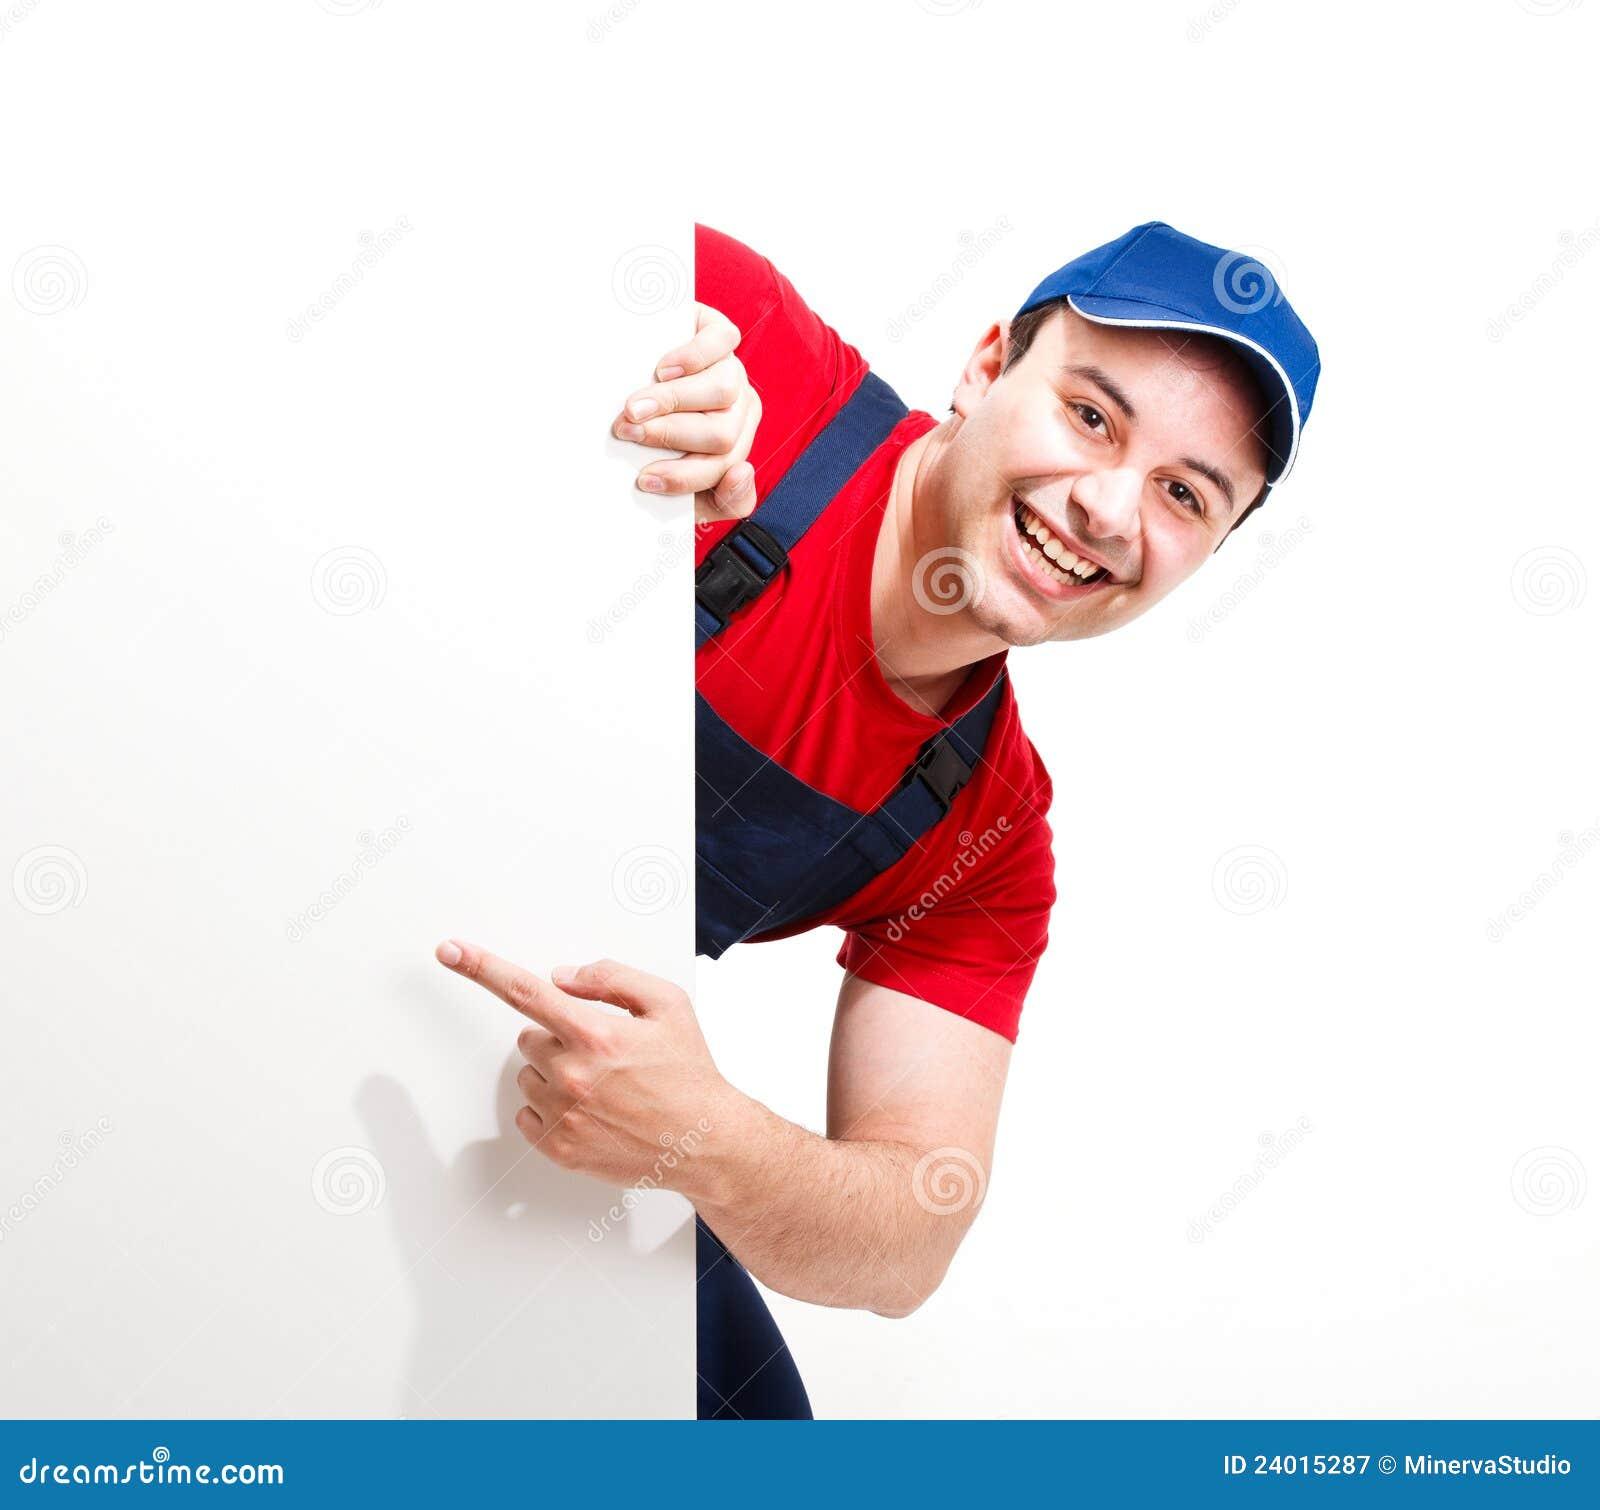 handyman business plan